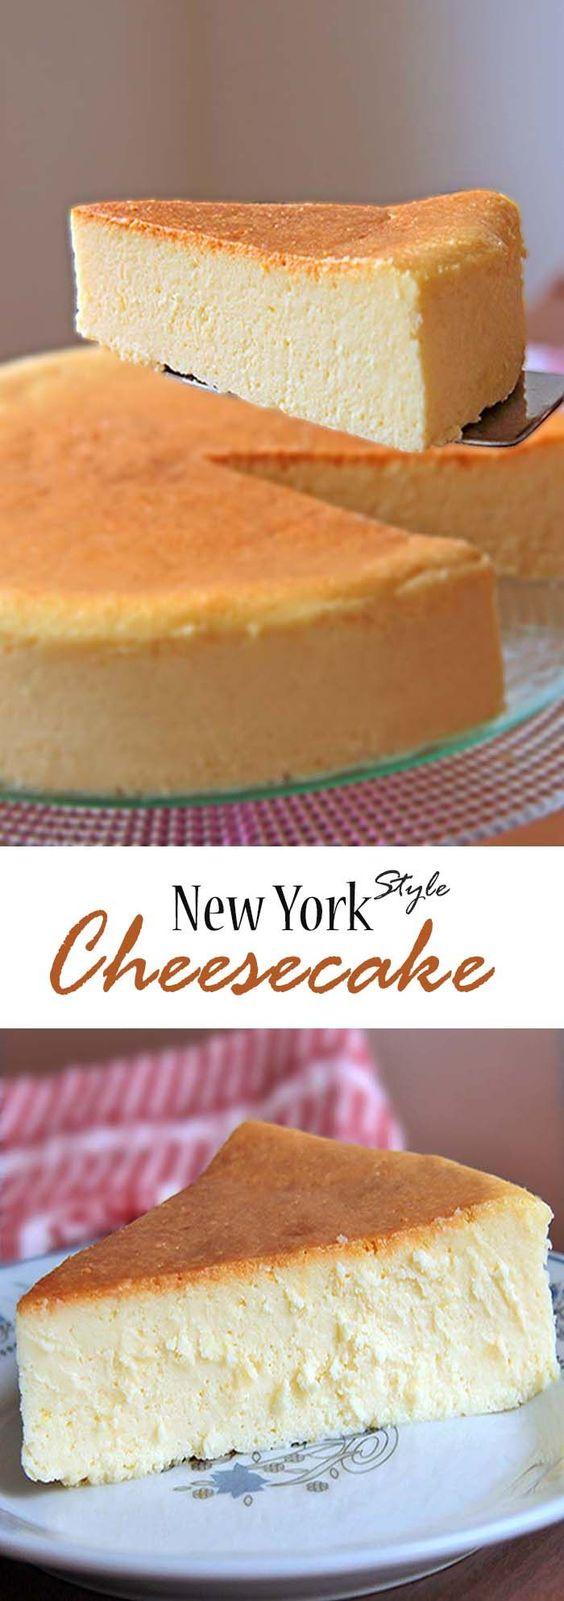 New York Style Cheesecake | Recipe | New York Style ...